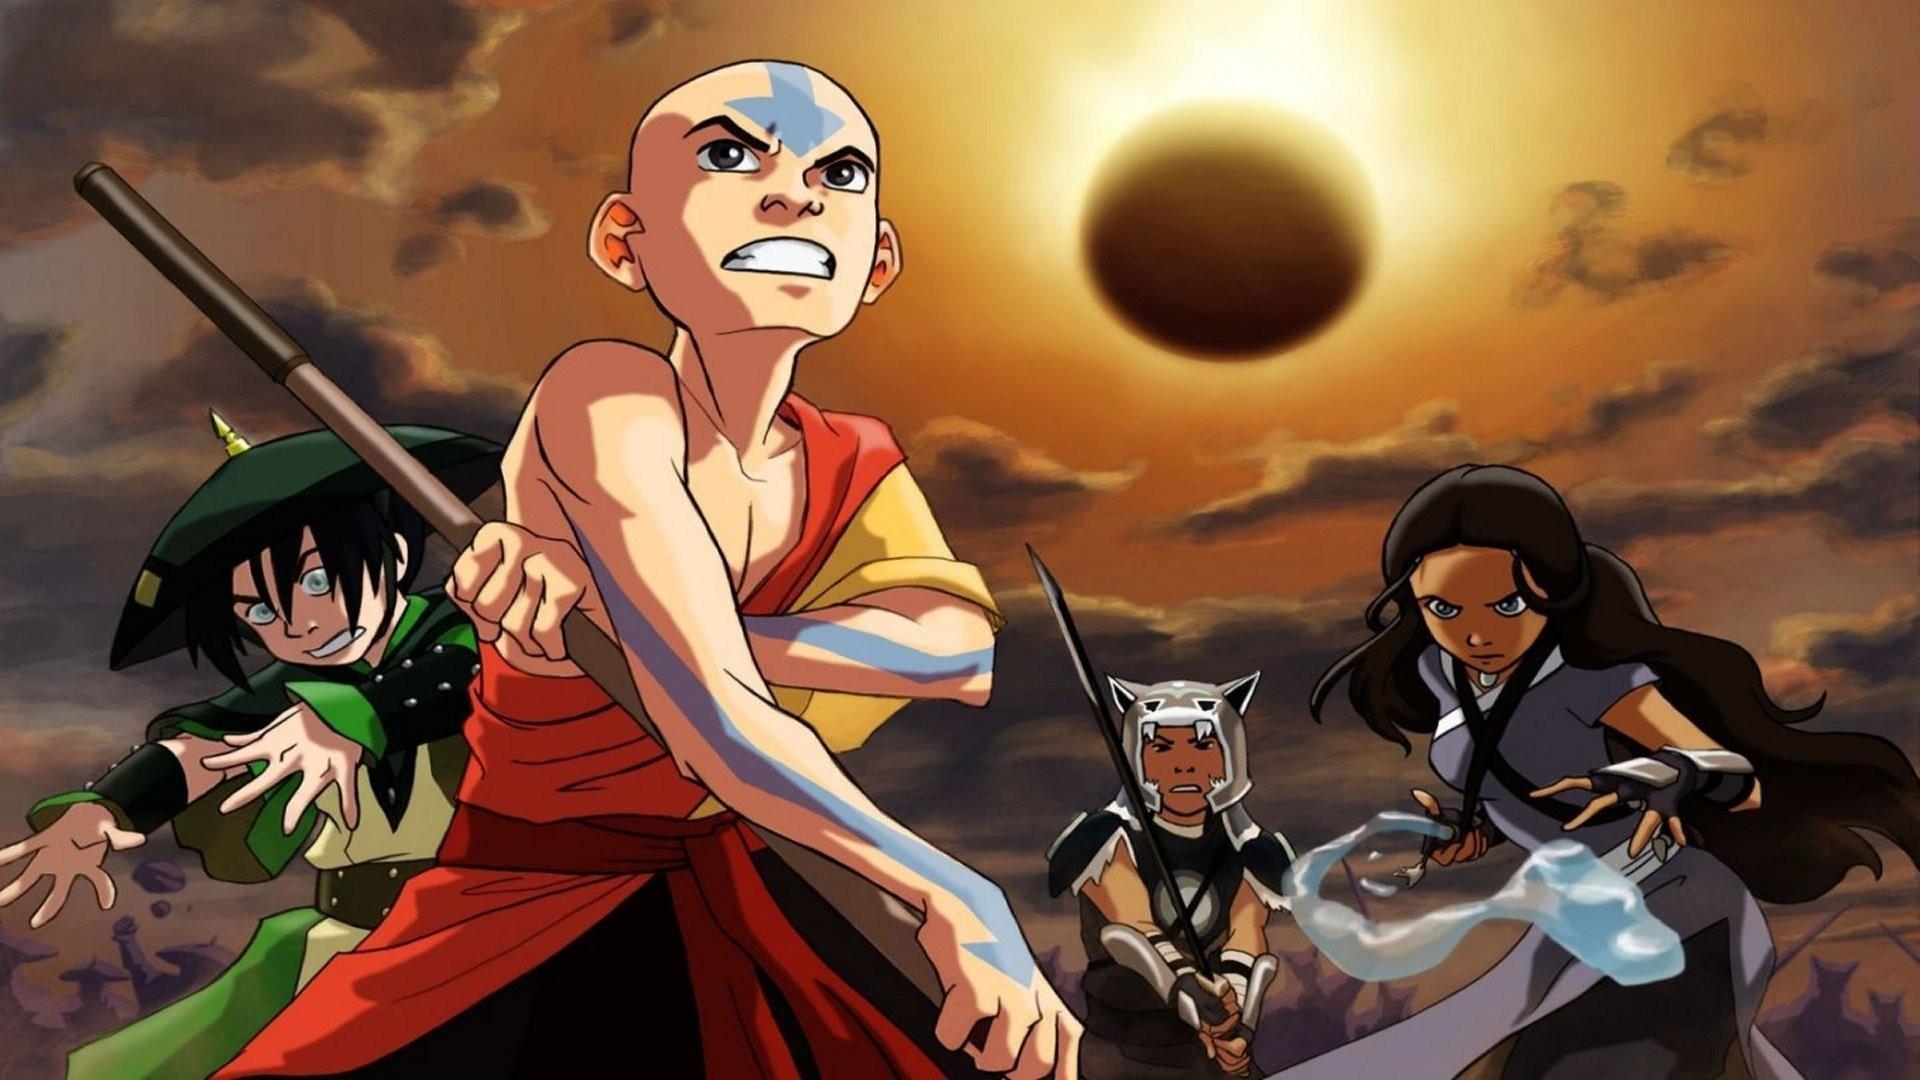 Anime Comics Avatar The Last Airbender Toph Beifong Aang Katara Sokka Screenshot